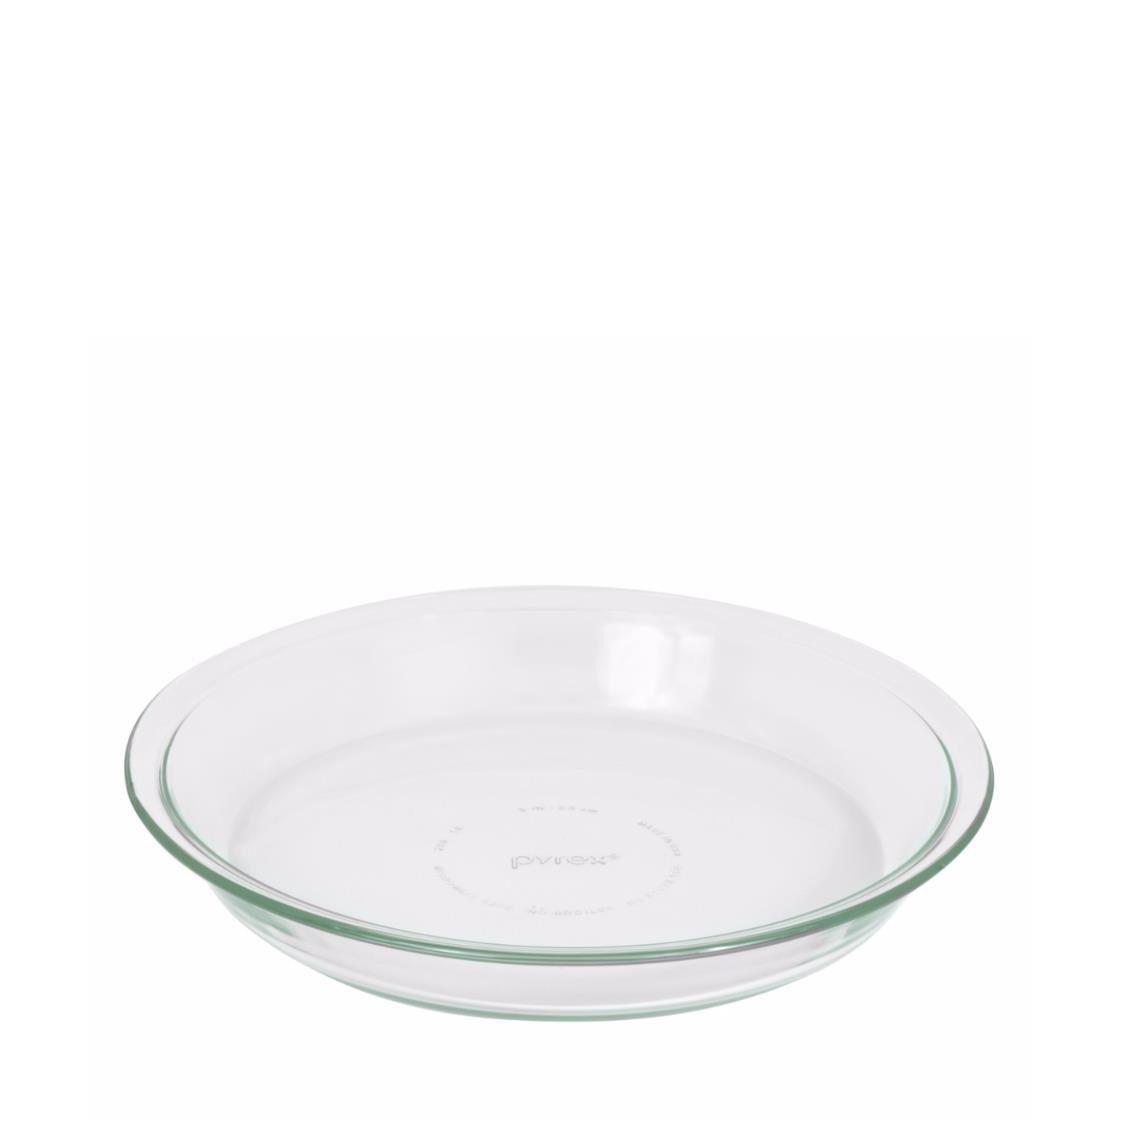 Pyrex Pie Plate